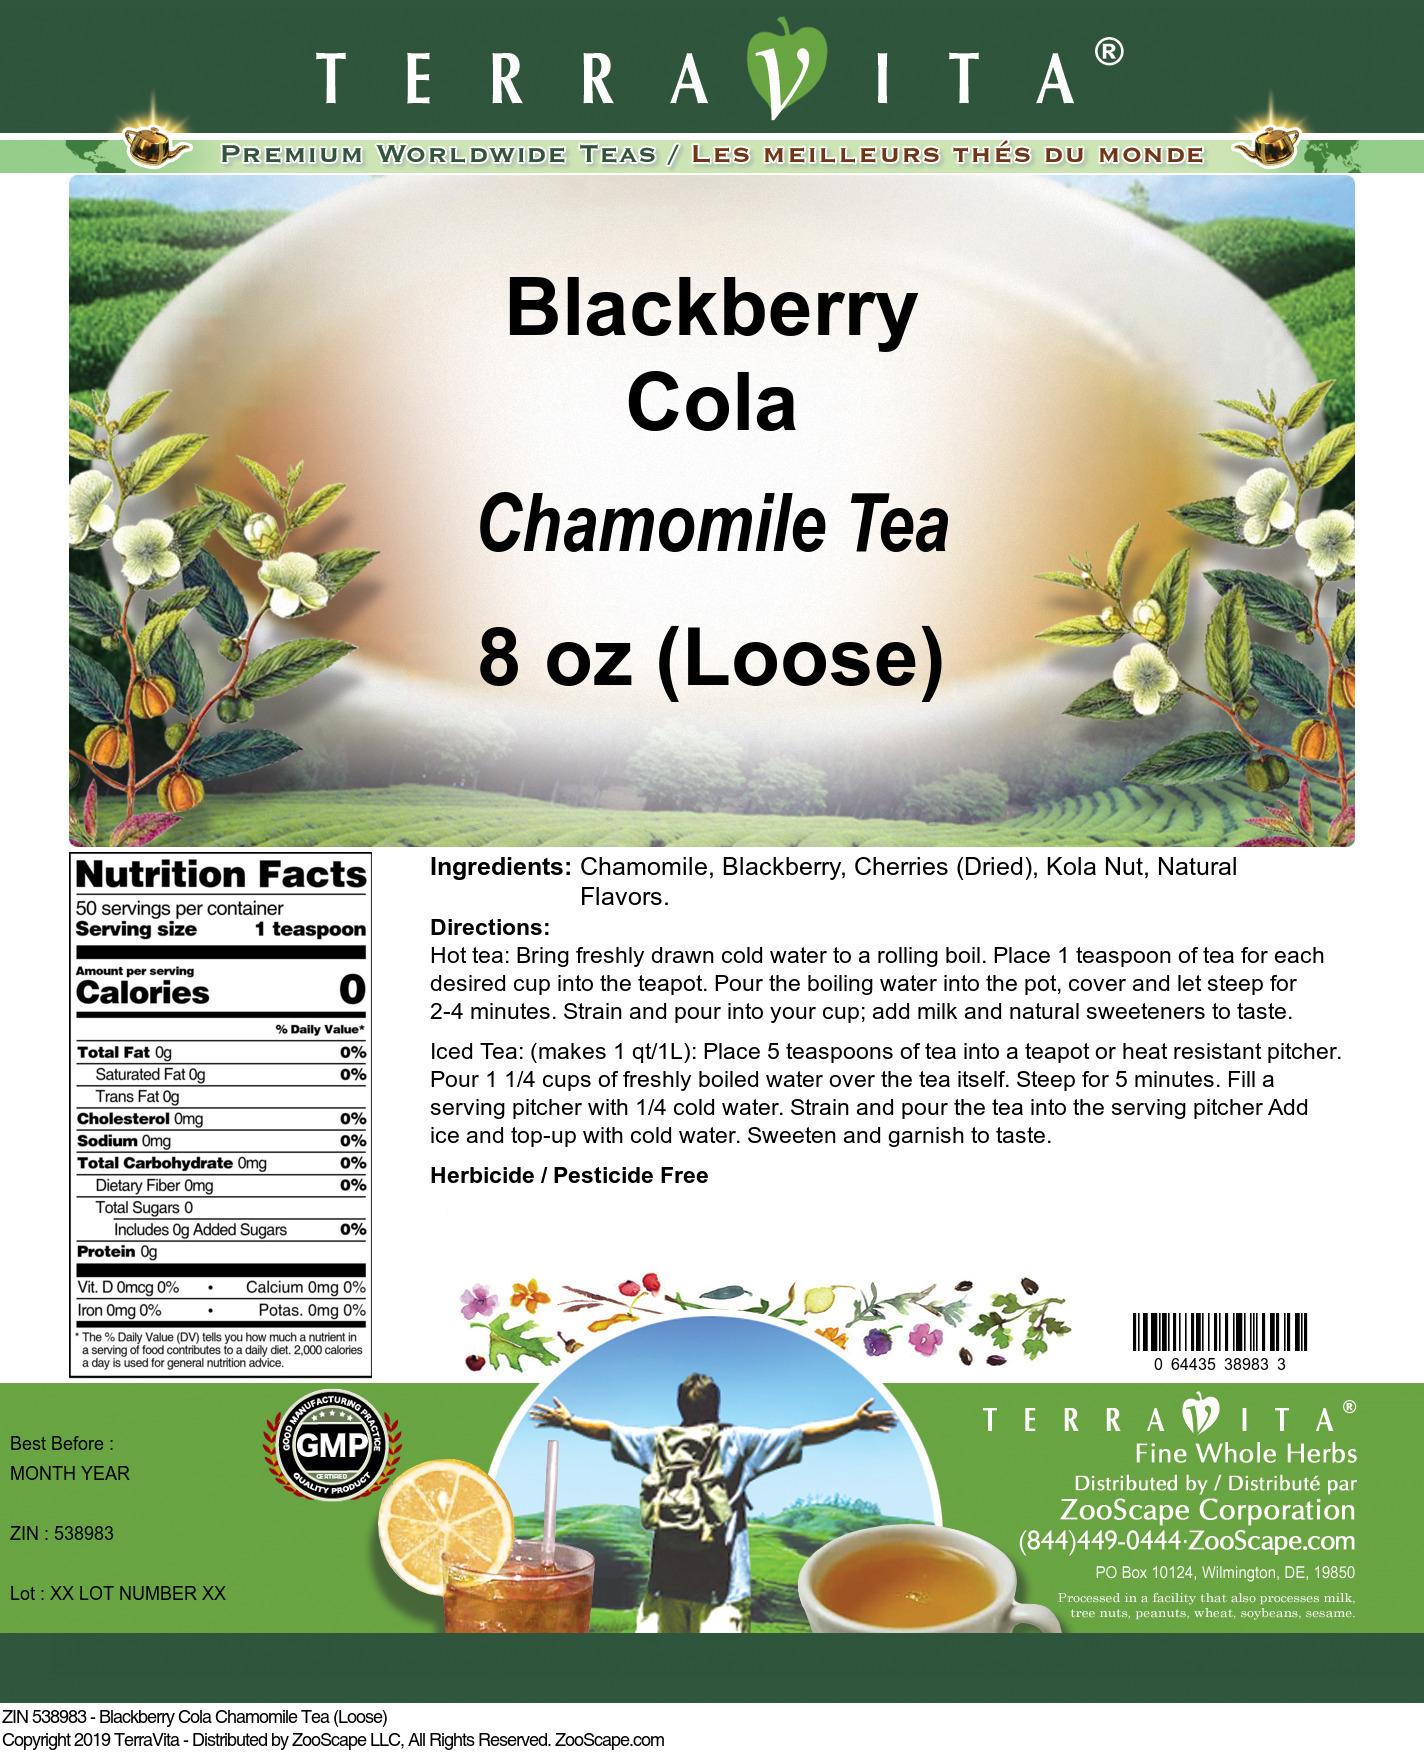 Blackberry Cola Chamomile Tea